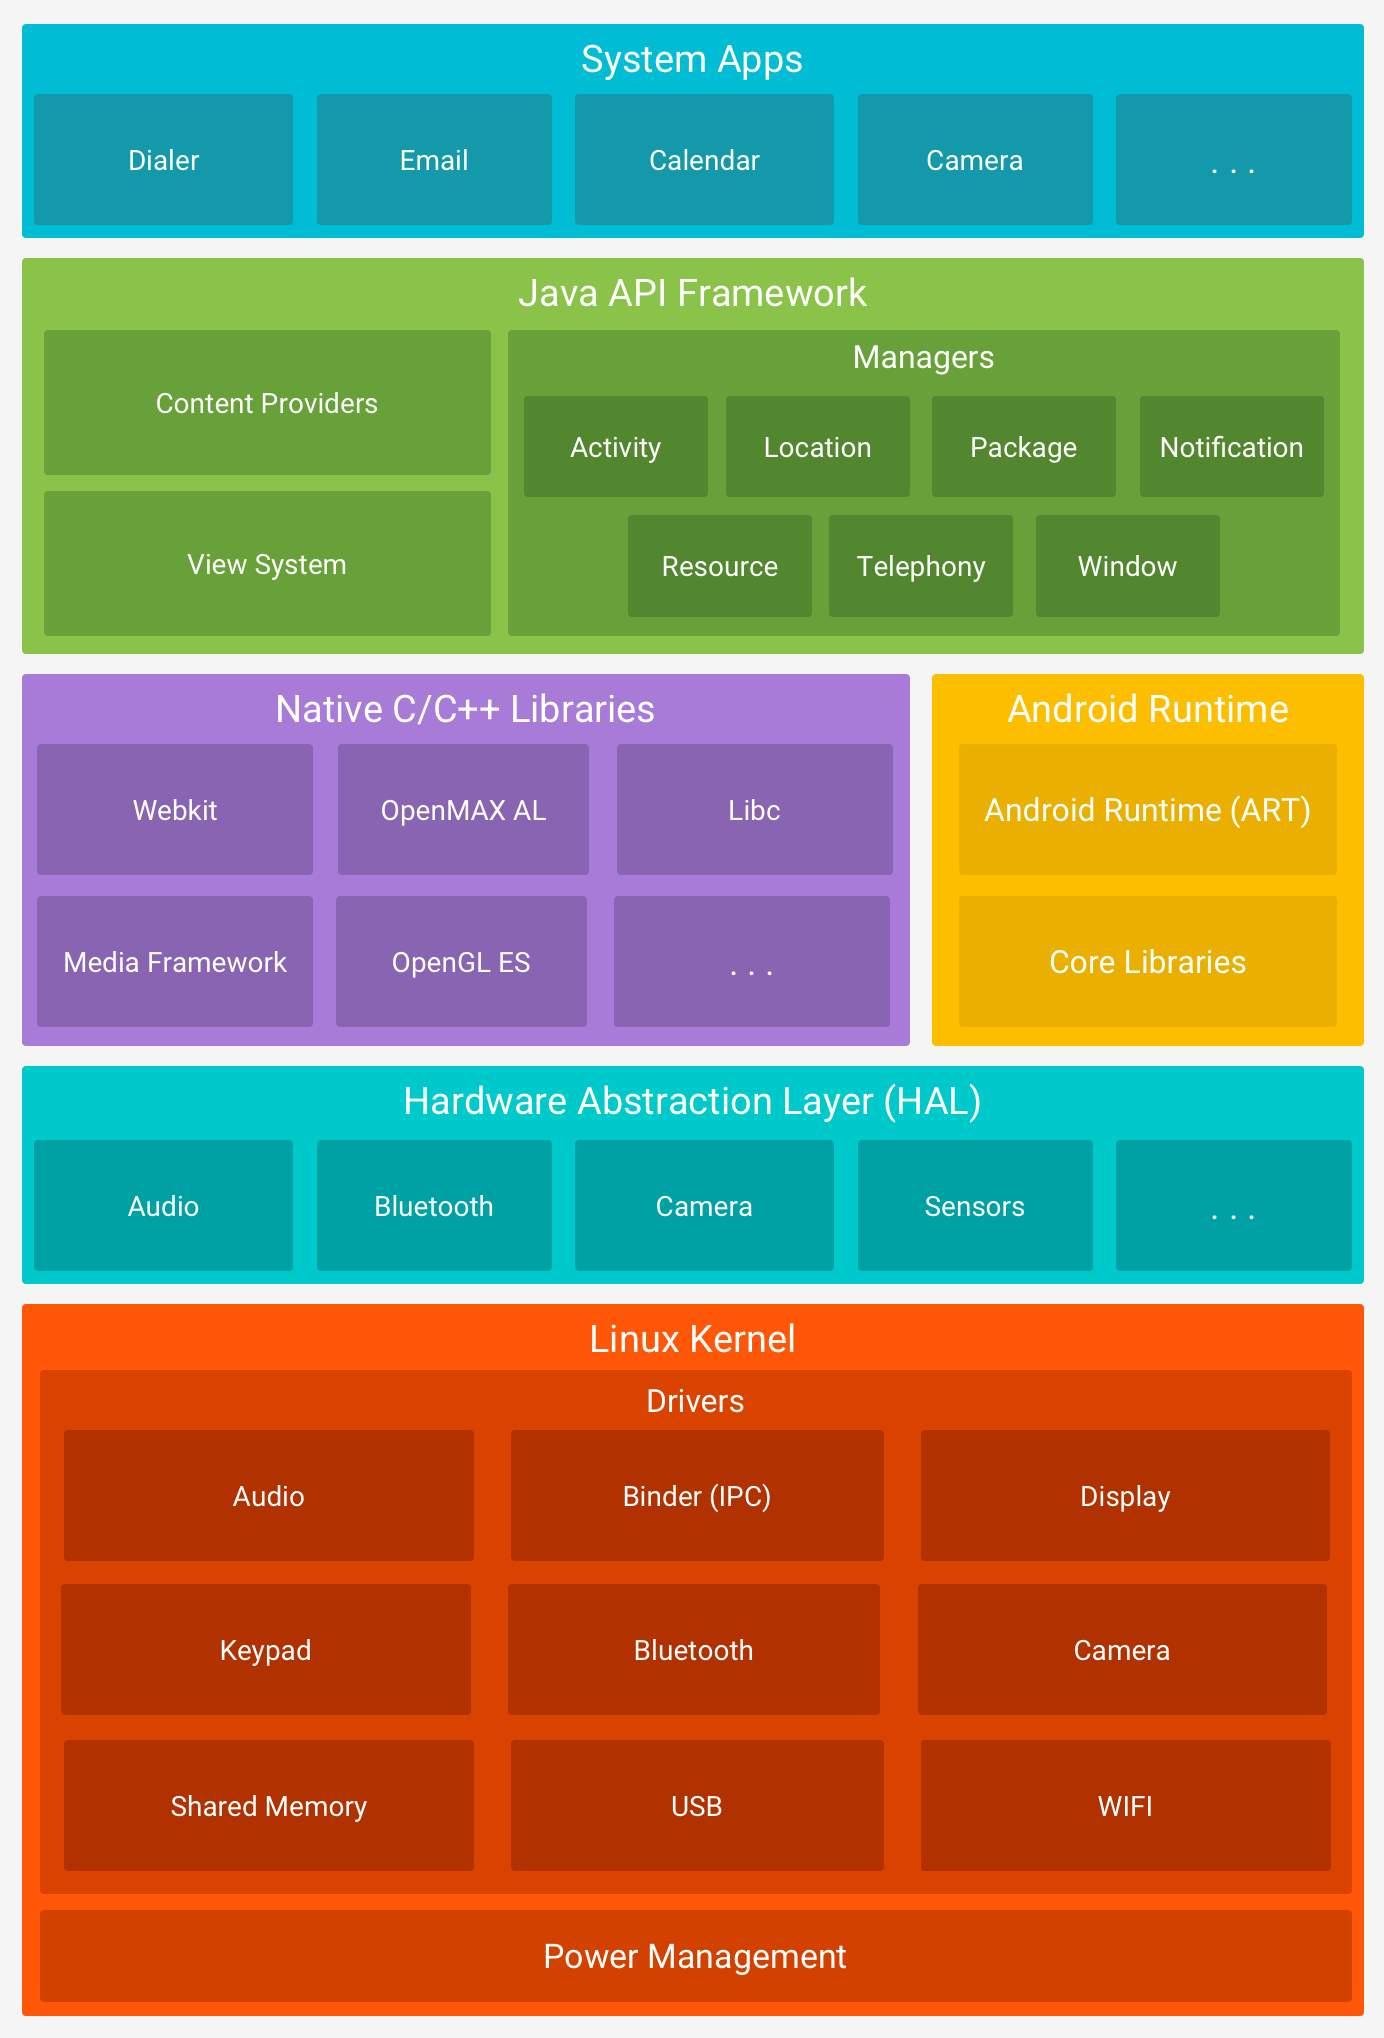 https://developer.android.com/guide/platform/images/android-stack_2x.png